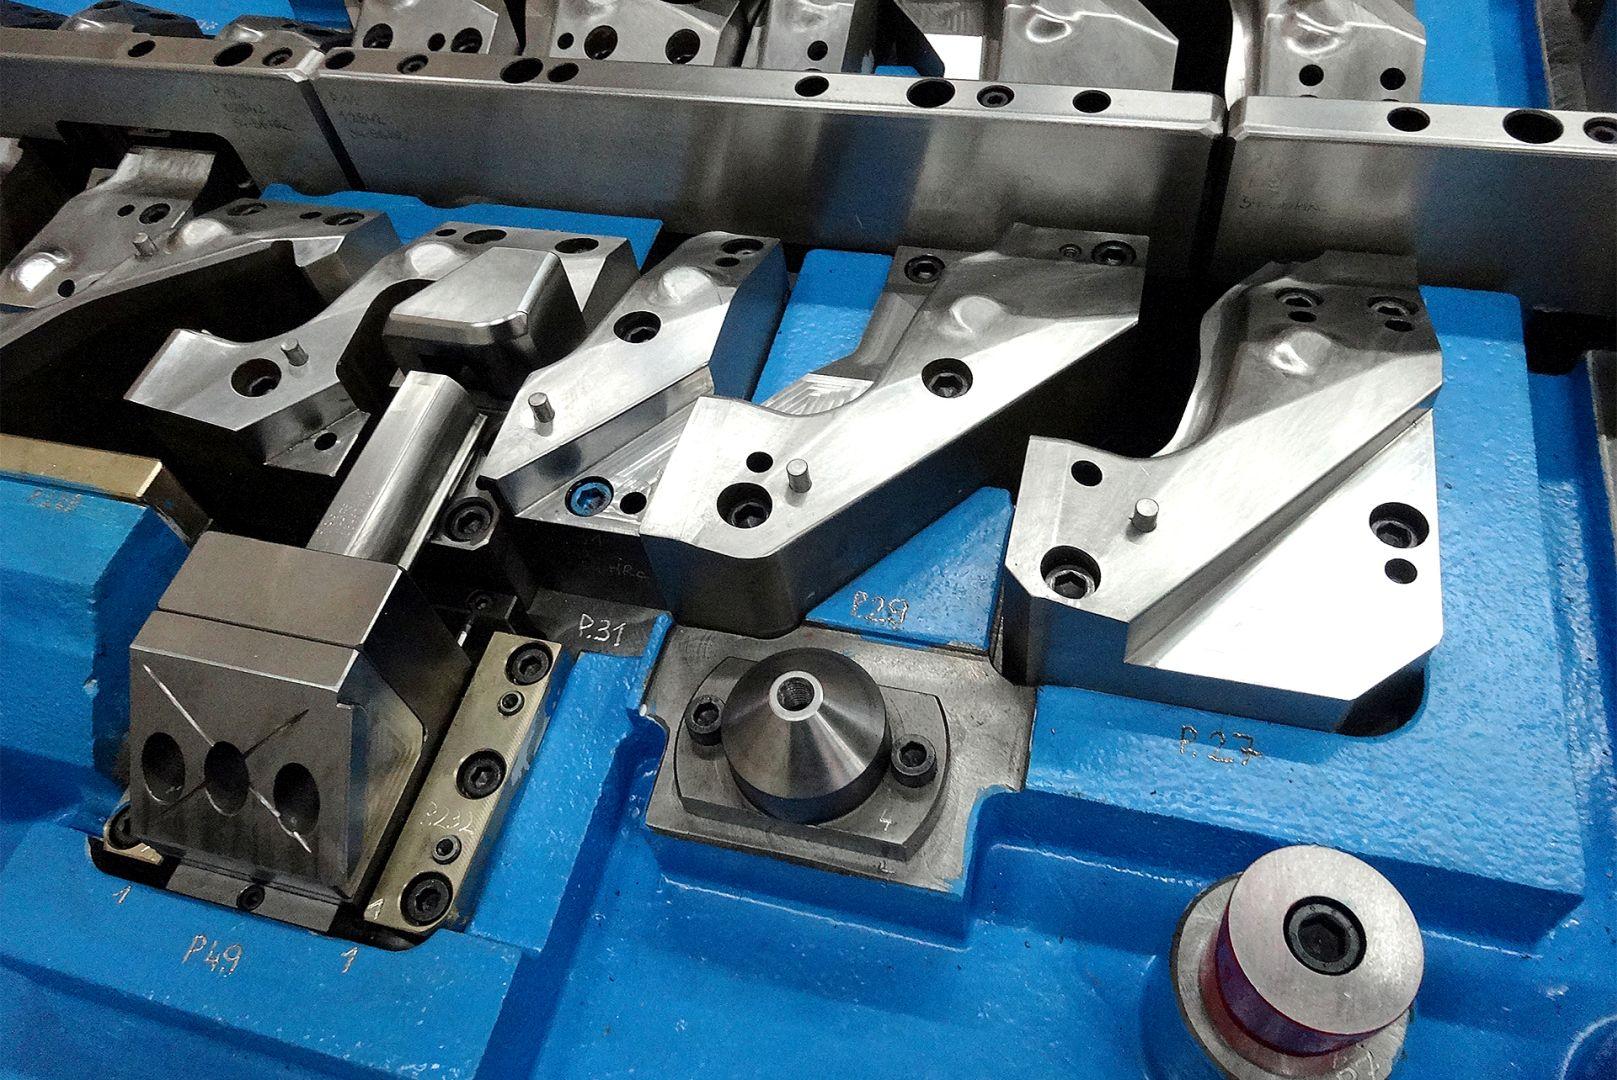 Toolshop–Werkzeugbau–orodjarstvo-2 Orodje za preoblikov plocevine _ slika 5a